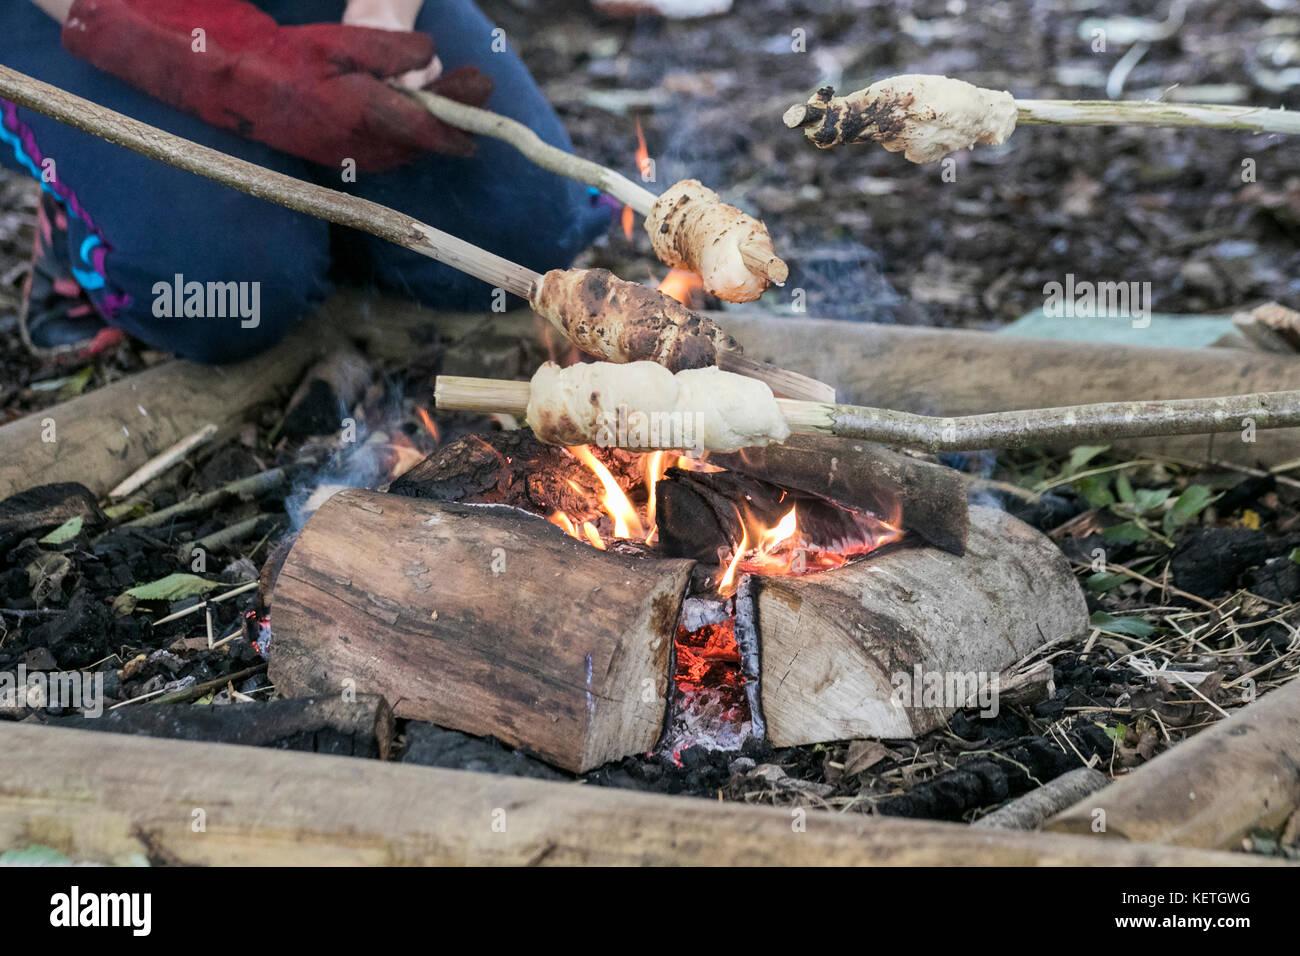 Kinder Kochen im Wald Lagerfeuer, Brockholes Naturschutzgebiet, Lancashire, Großbritannien Stockbild